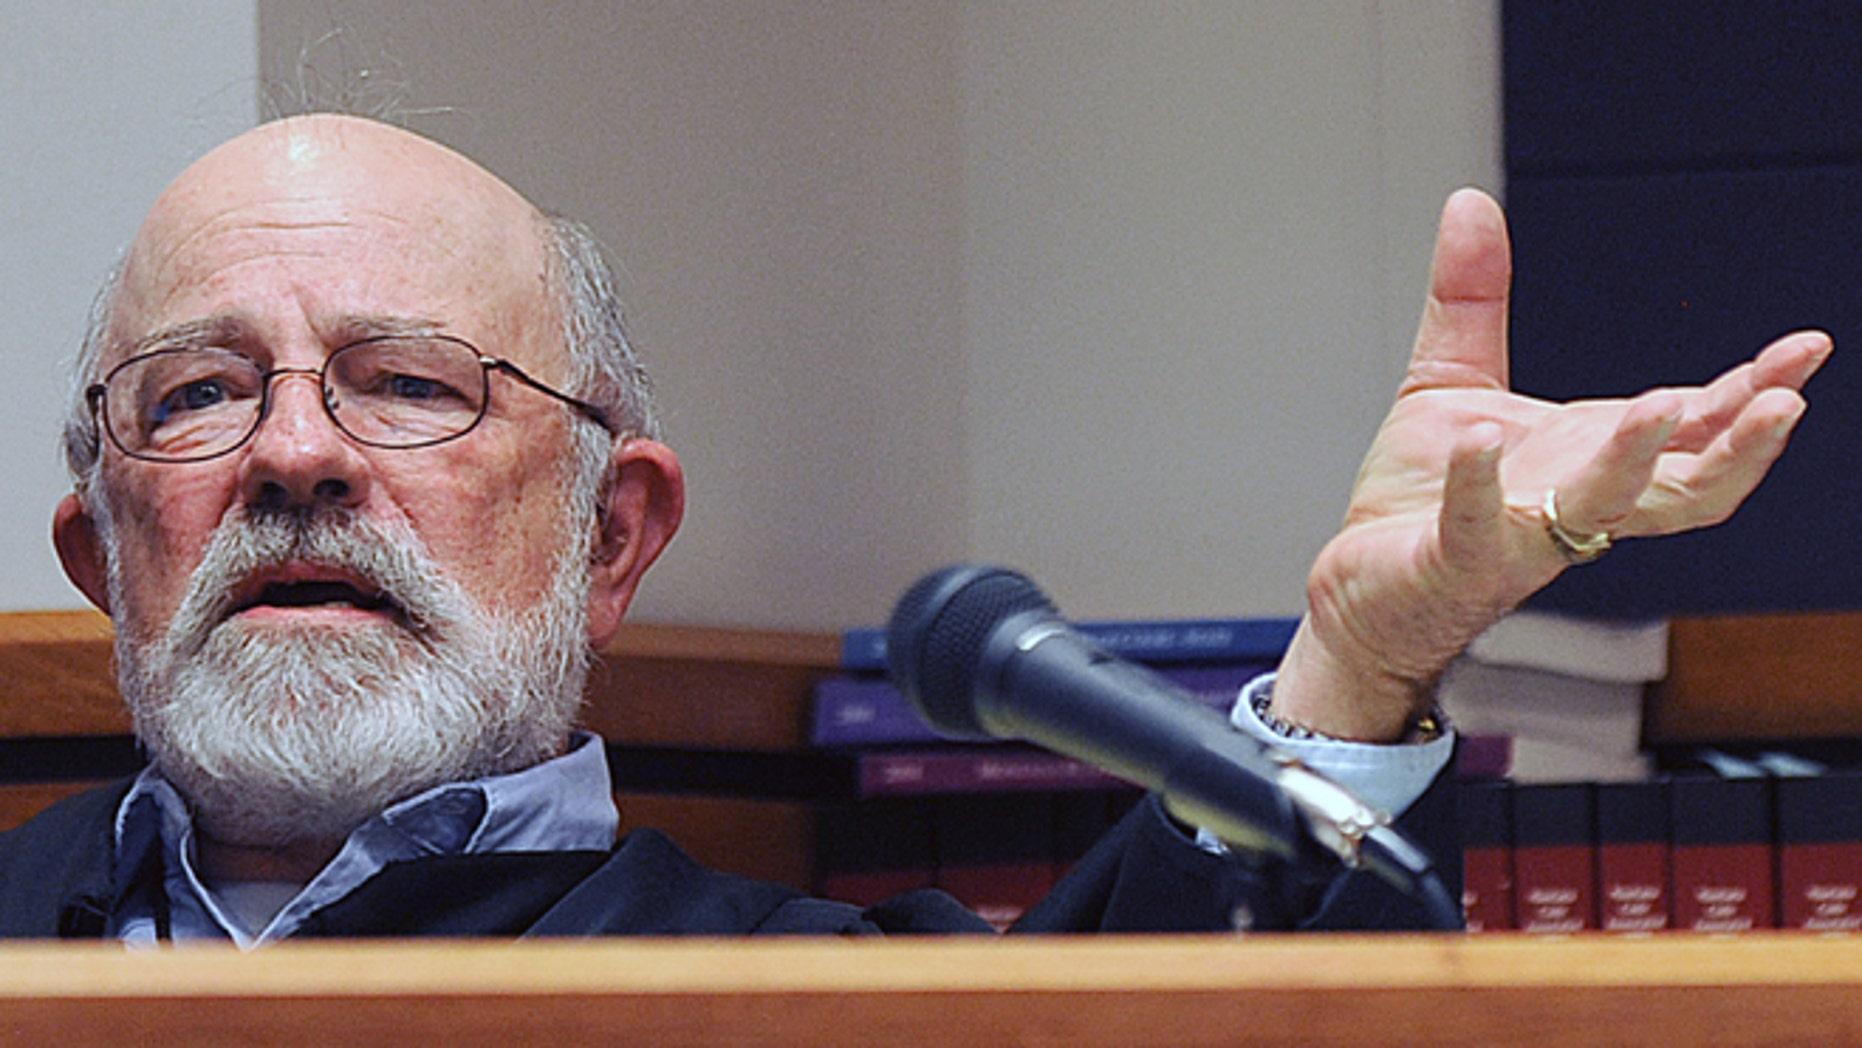 Montana District Judge G. Todd Baugh.